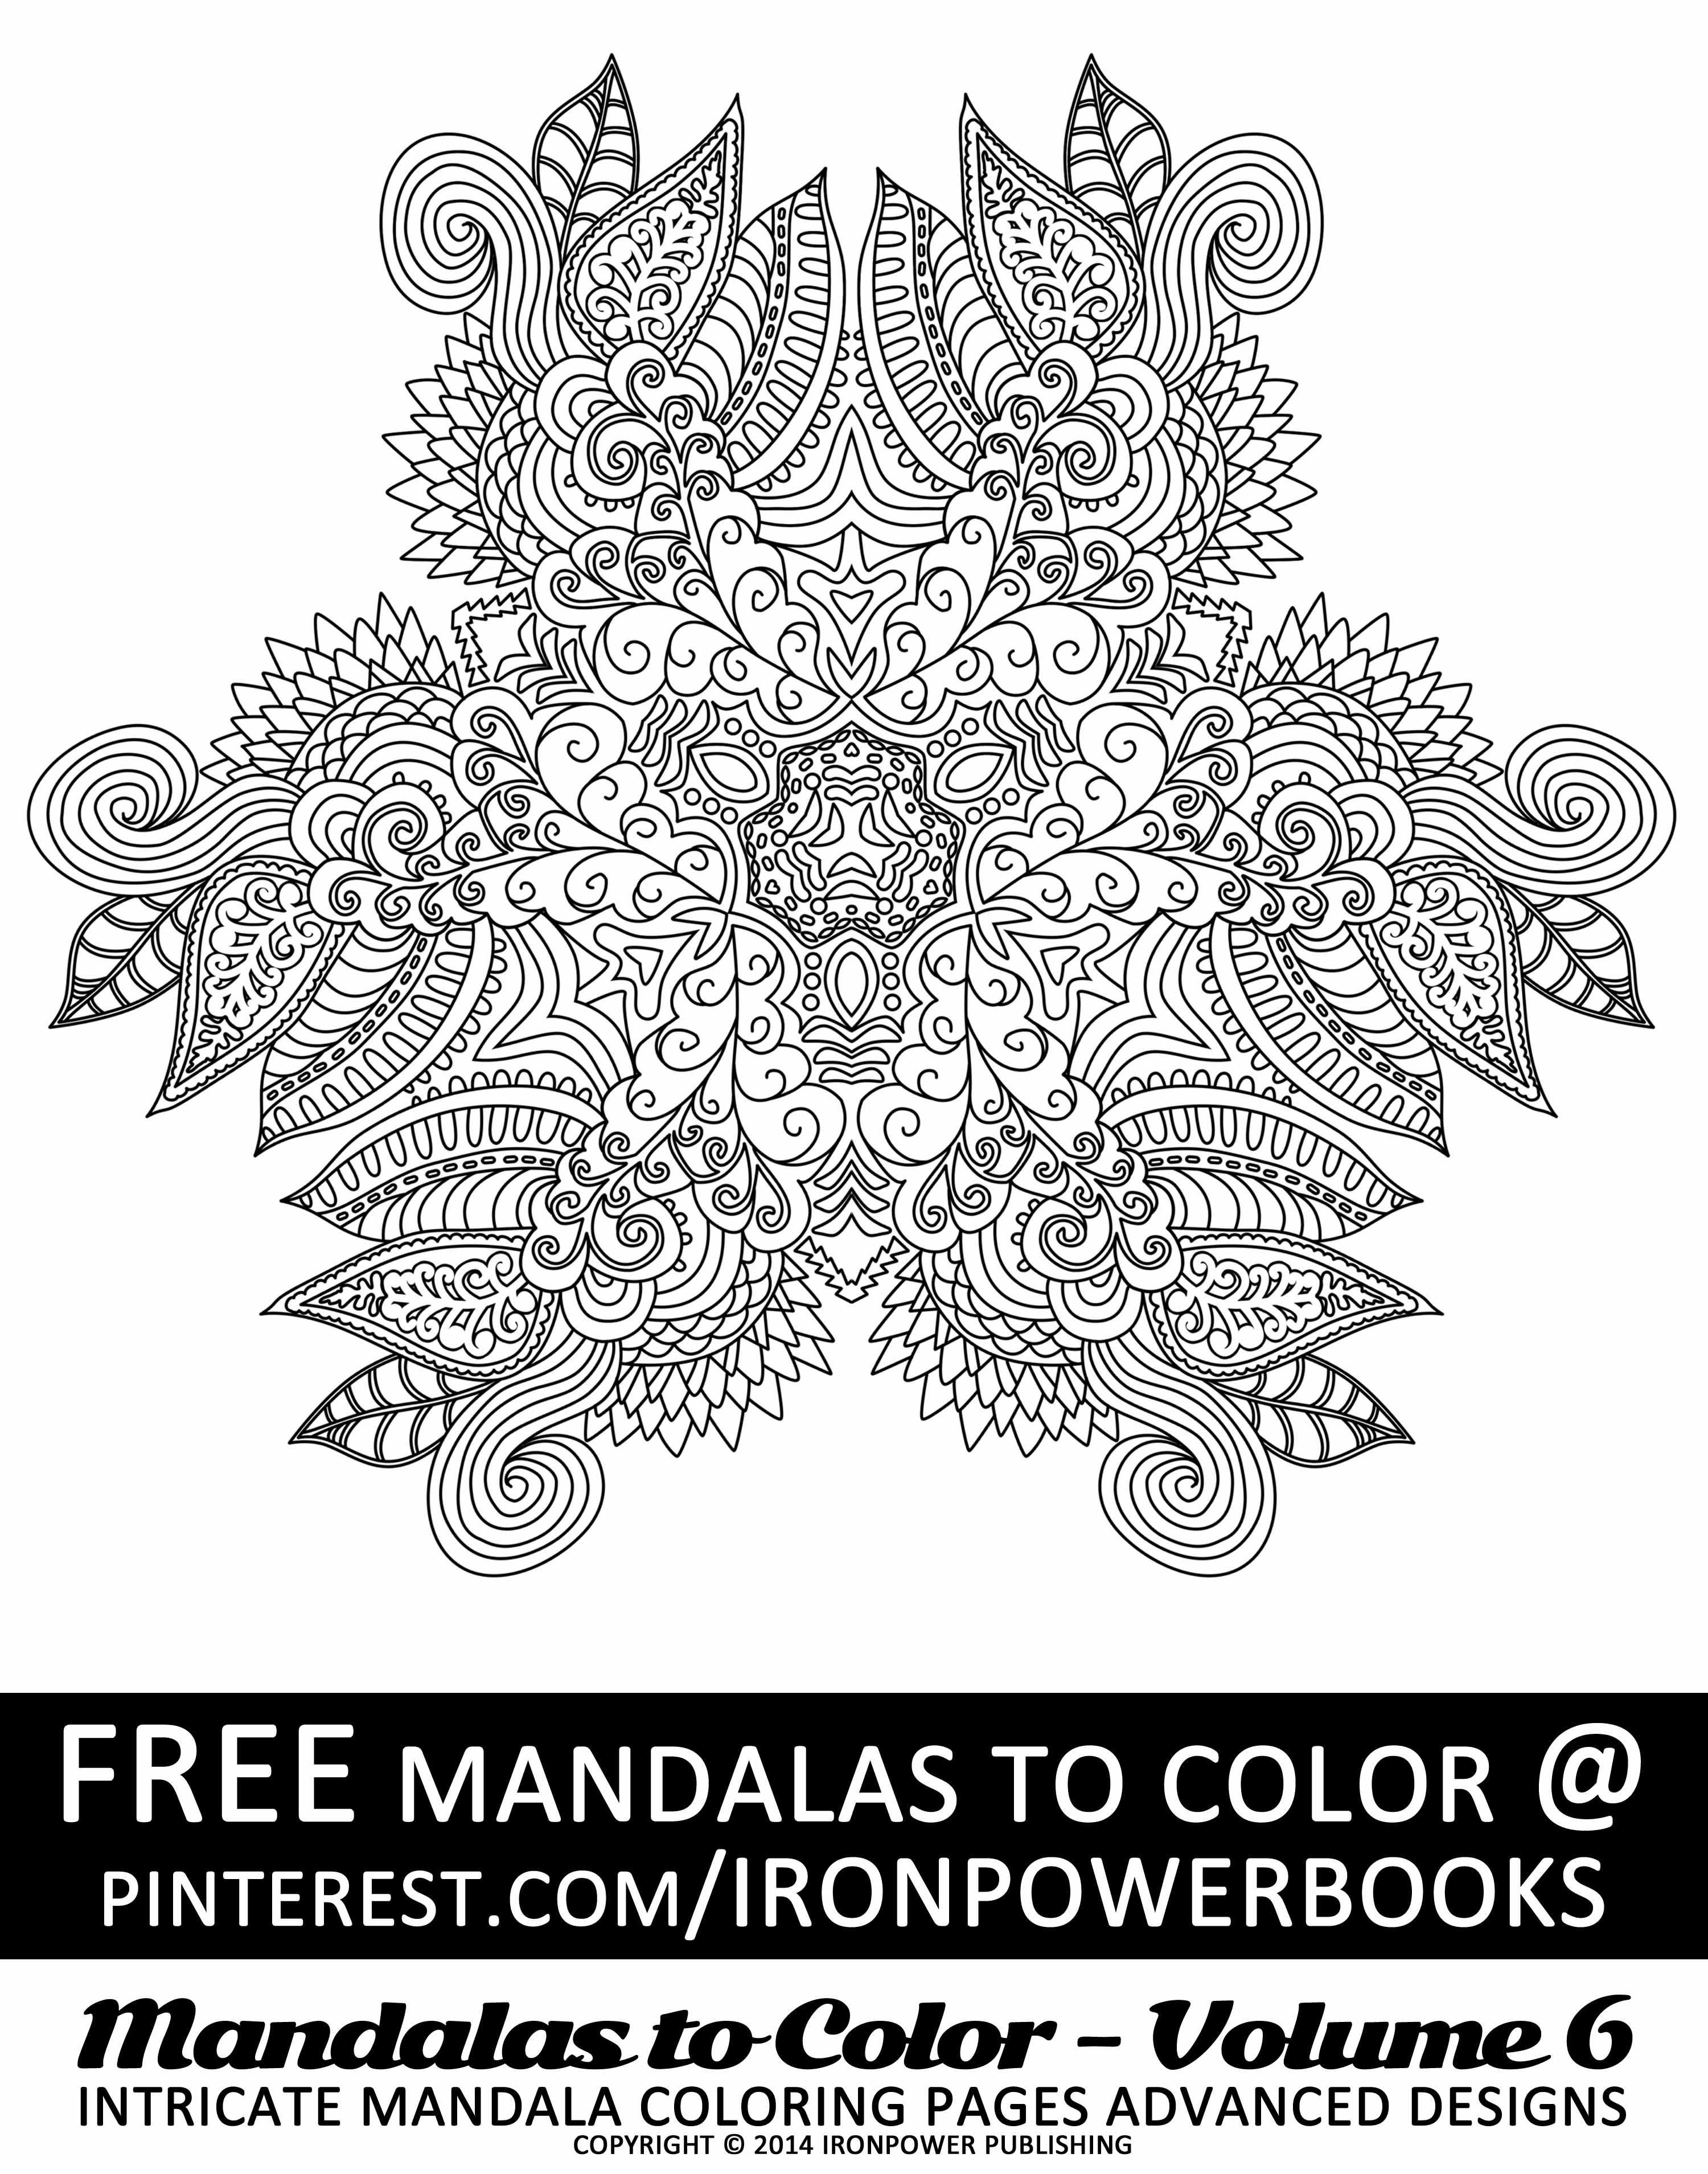 FREE Printable Mandala Coloring Pages for Adults | Intricate Mandala ...